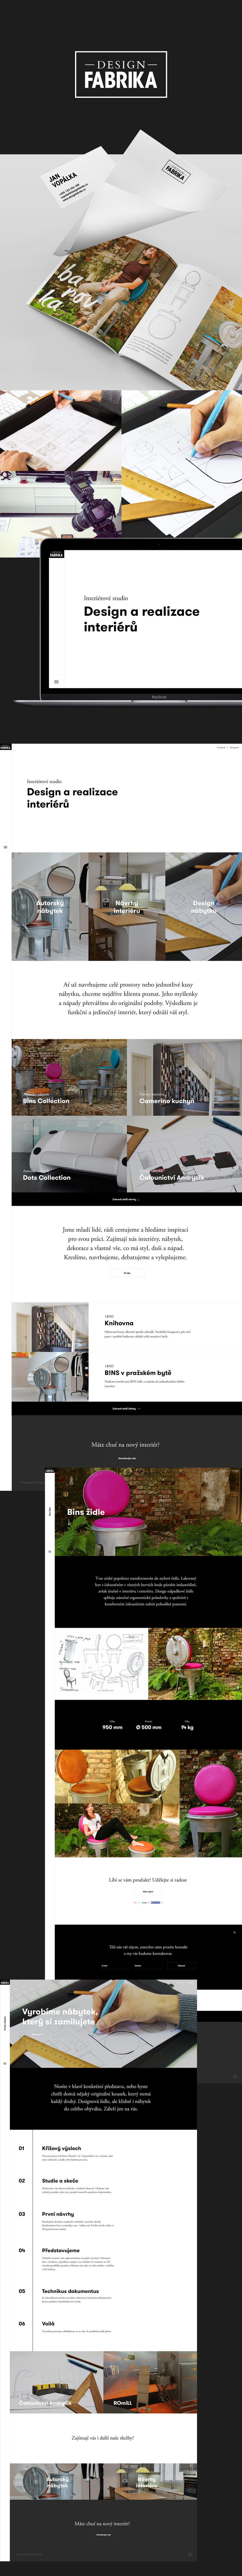 Webdesign brand print